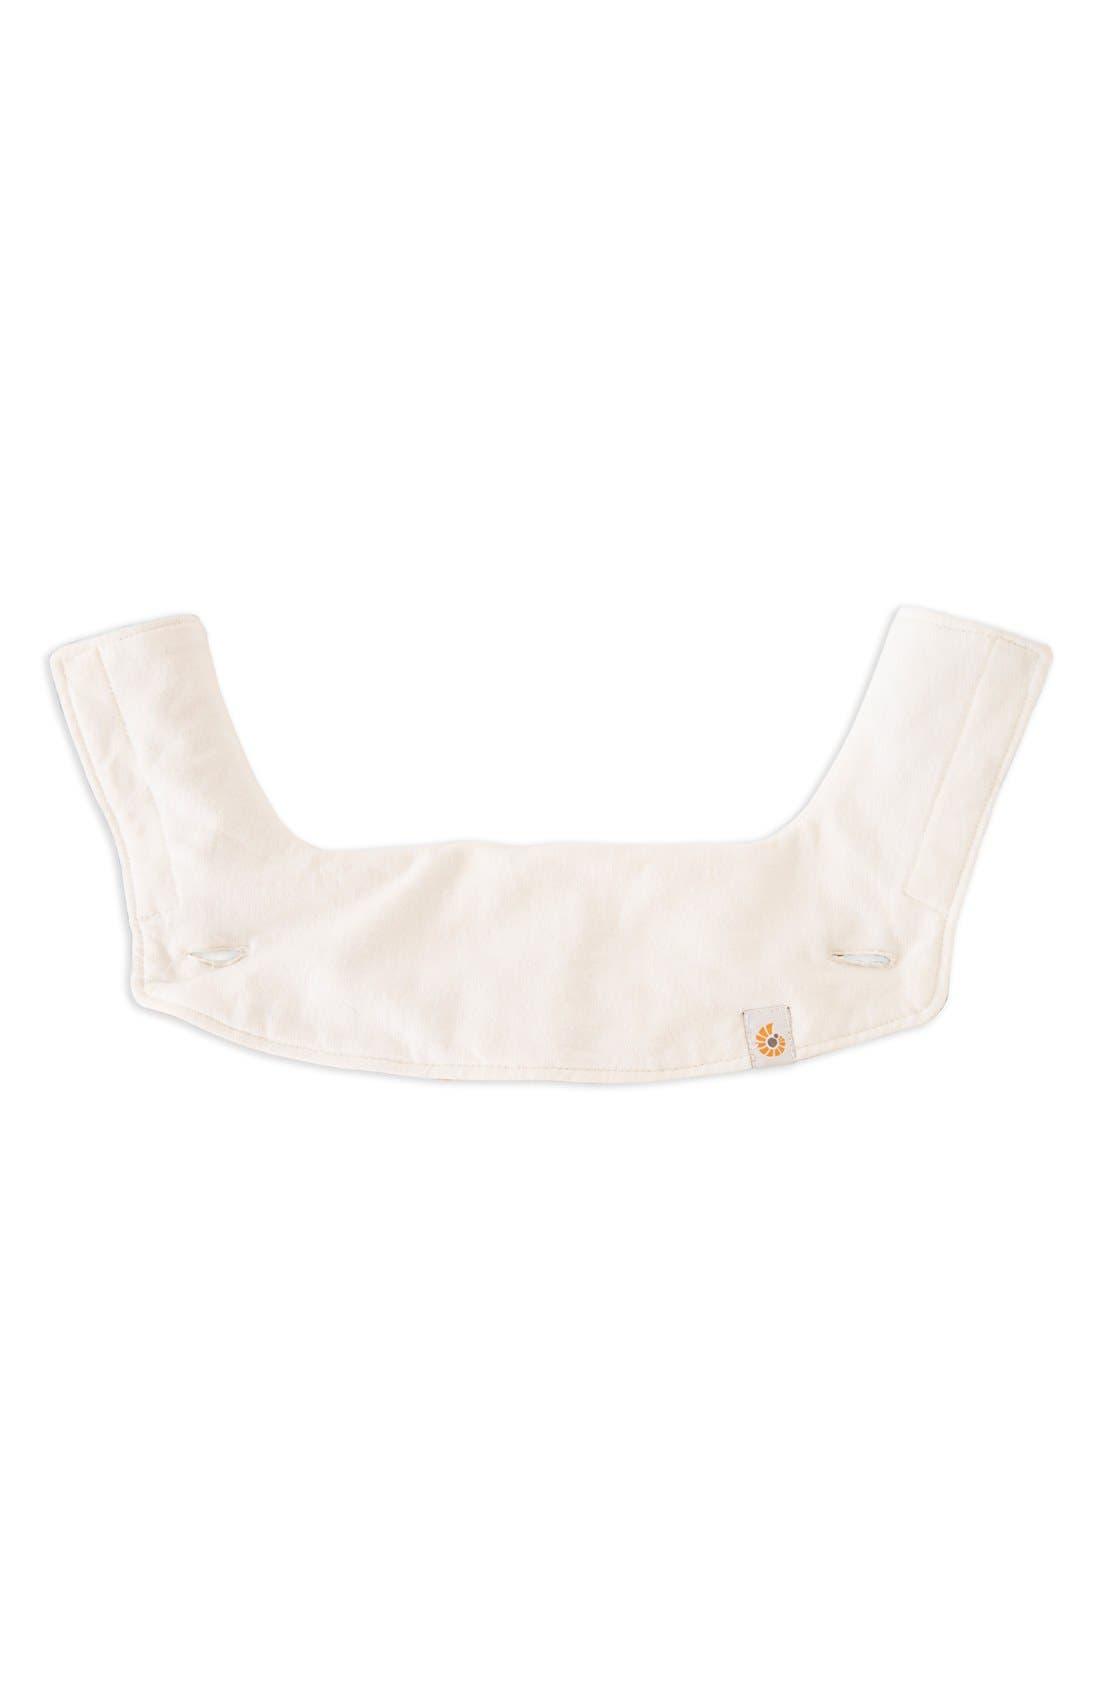 Infant Ergobaby 360 Carrier Teething Pad  Bib Size One Size  Beige